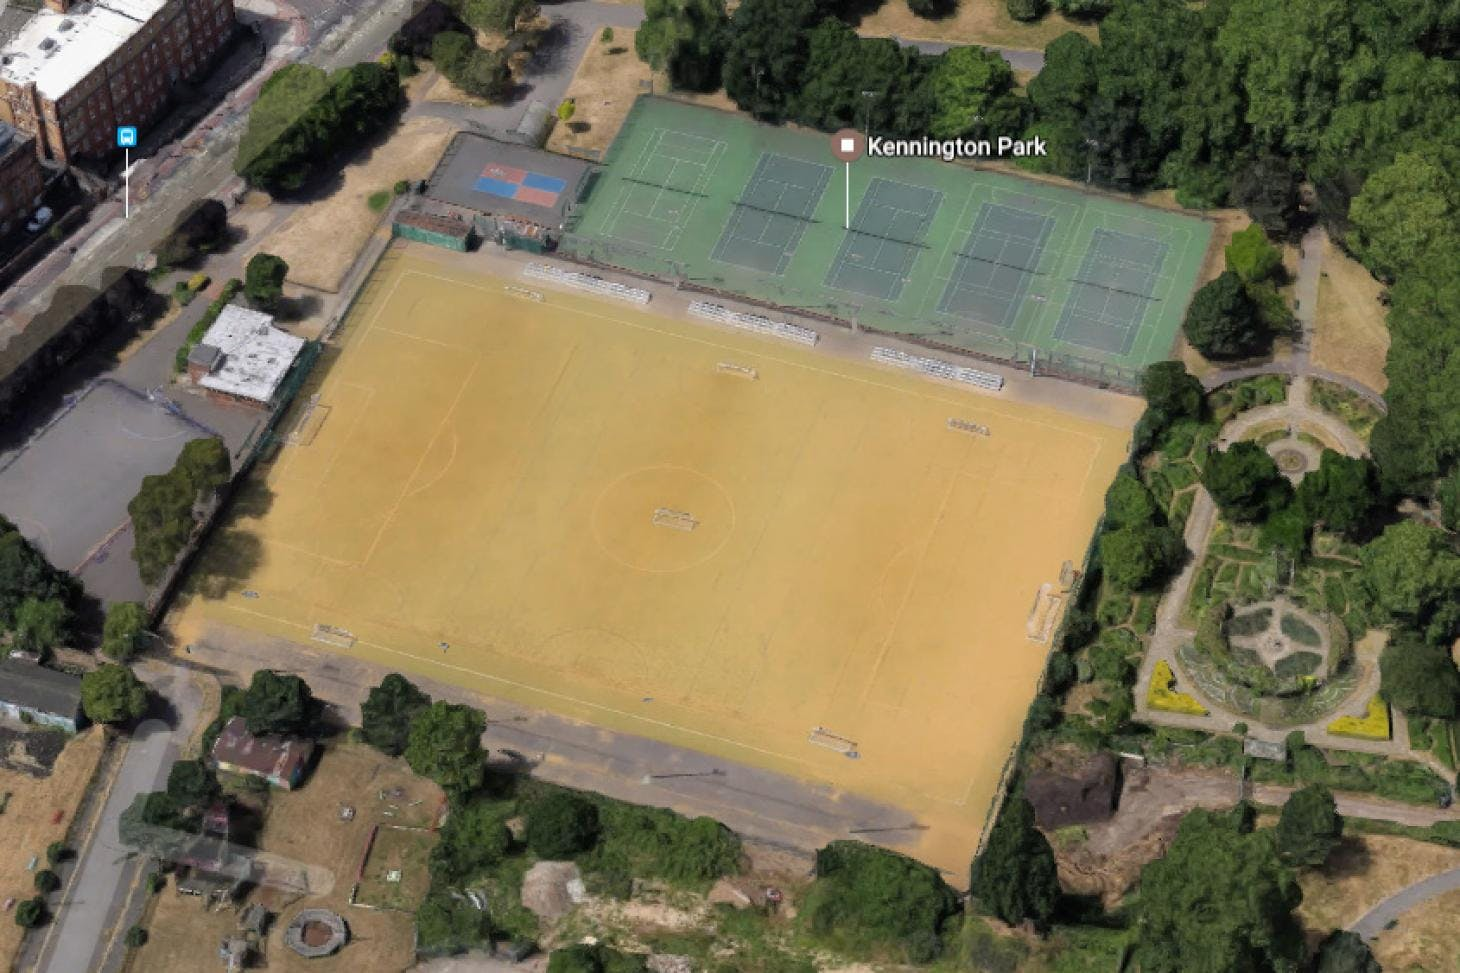 Kennington Park Outdoor | Hard (macadam) netball court